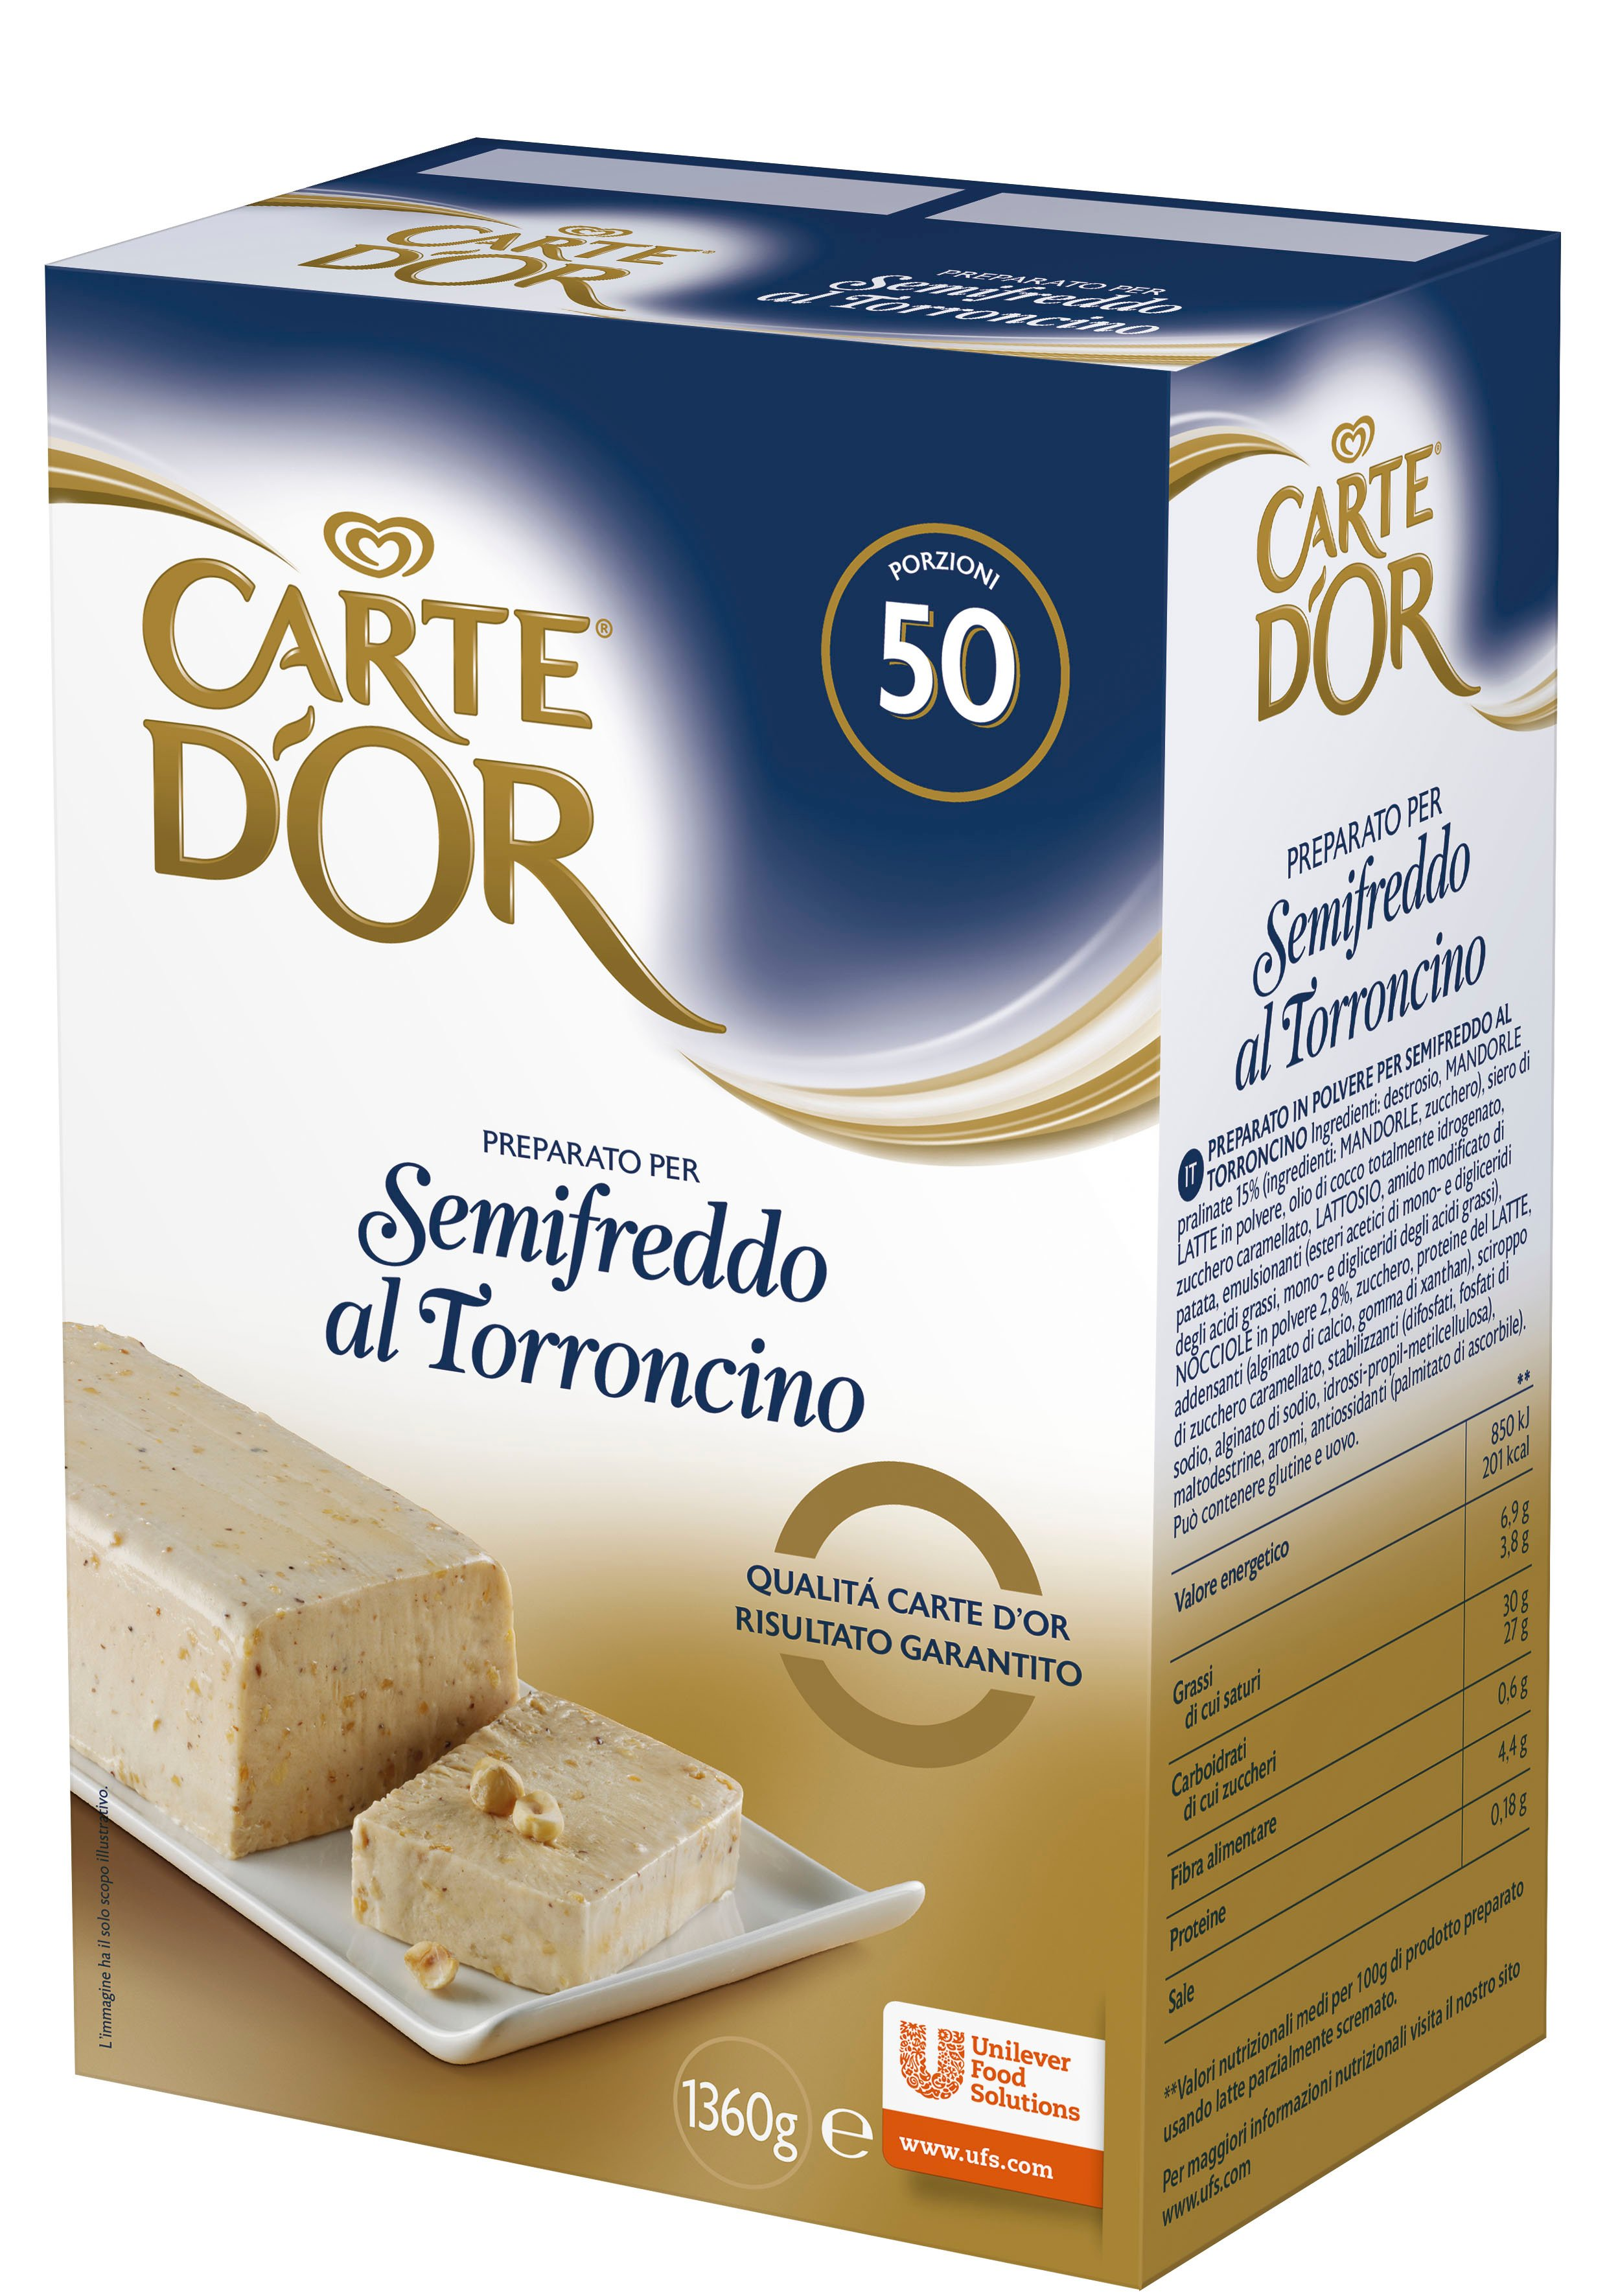 Carte d'Or preparato per Semifreddo al Torroncino 1,36 Kg -